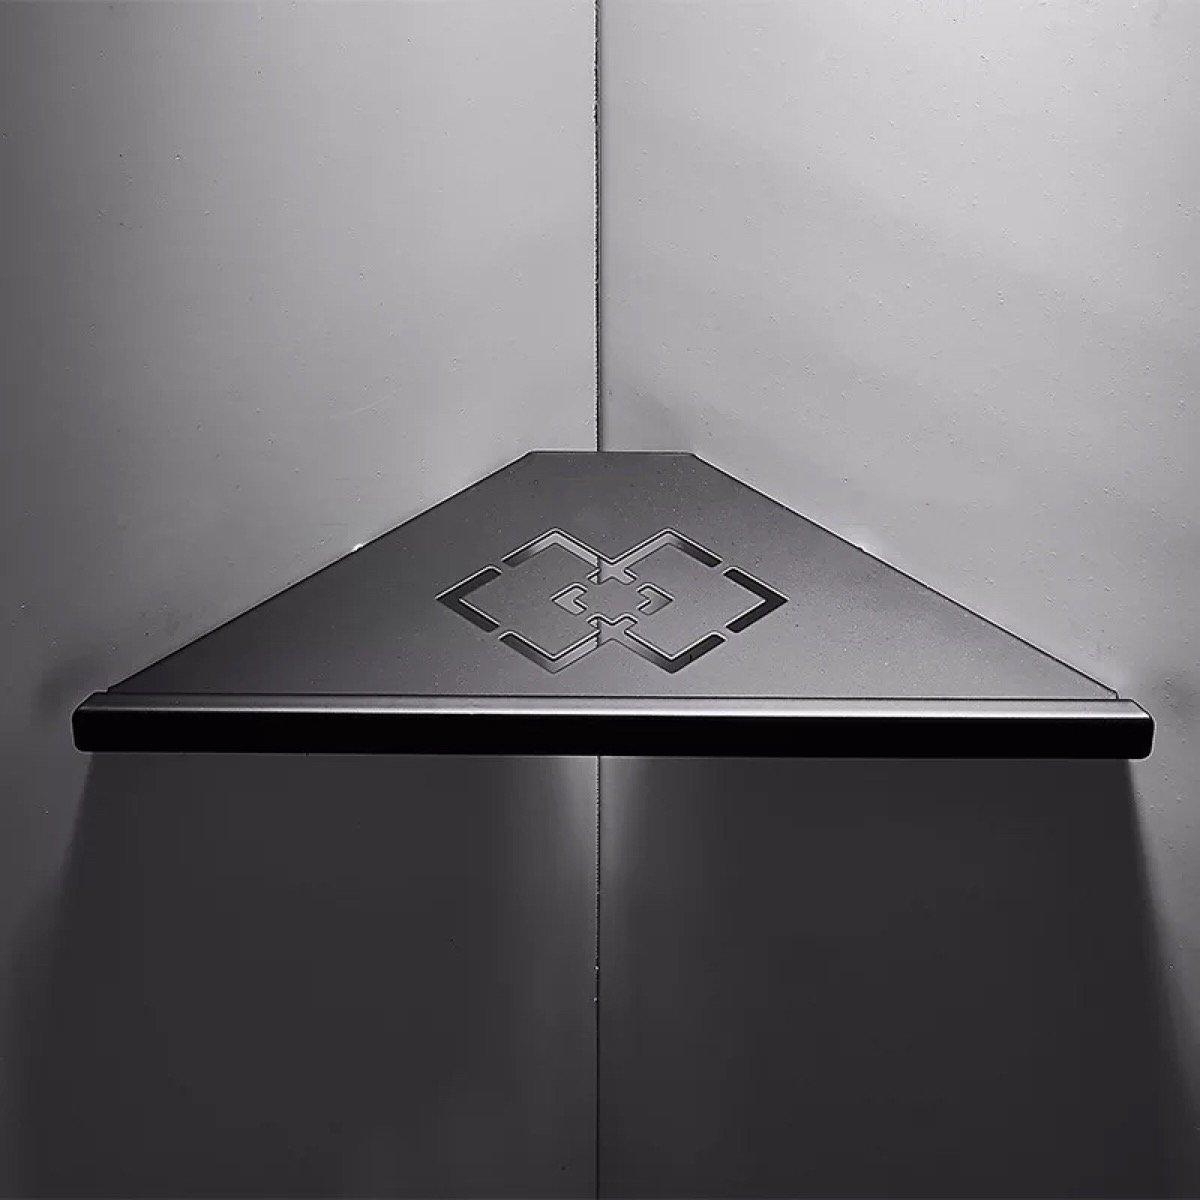 Carved Hollow Out Black Matte Corner Shower Holder 304 Stainless Steel Bathroom Shelf 1 Layer Bathroom Shelves Aliexpress